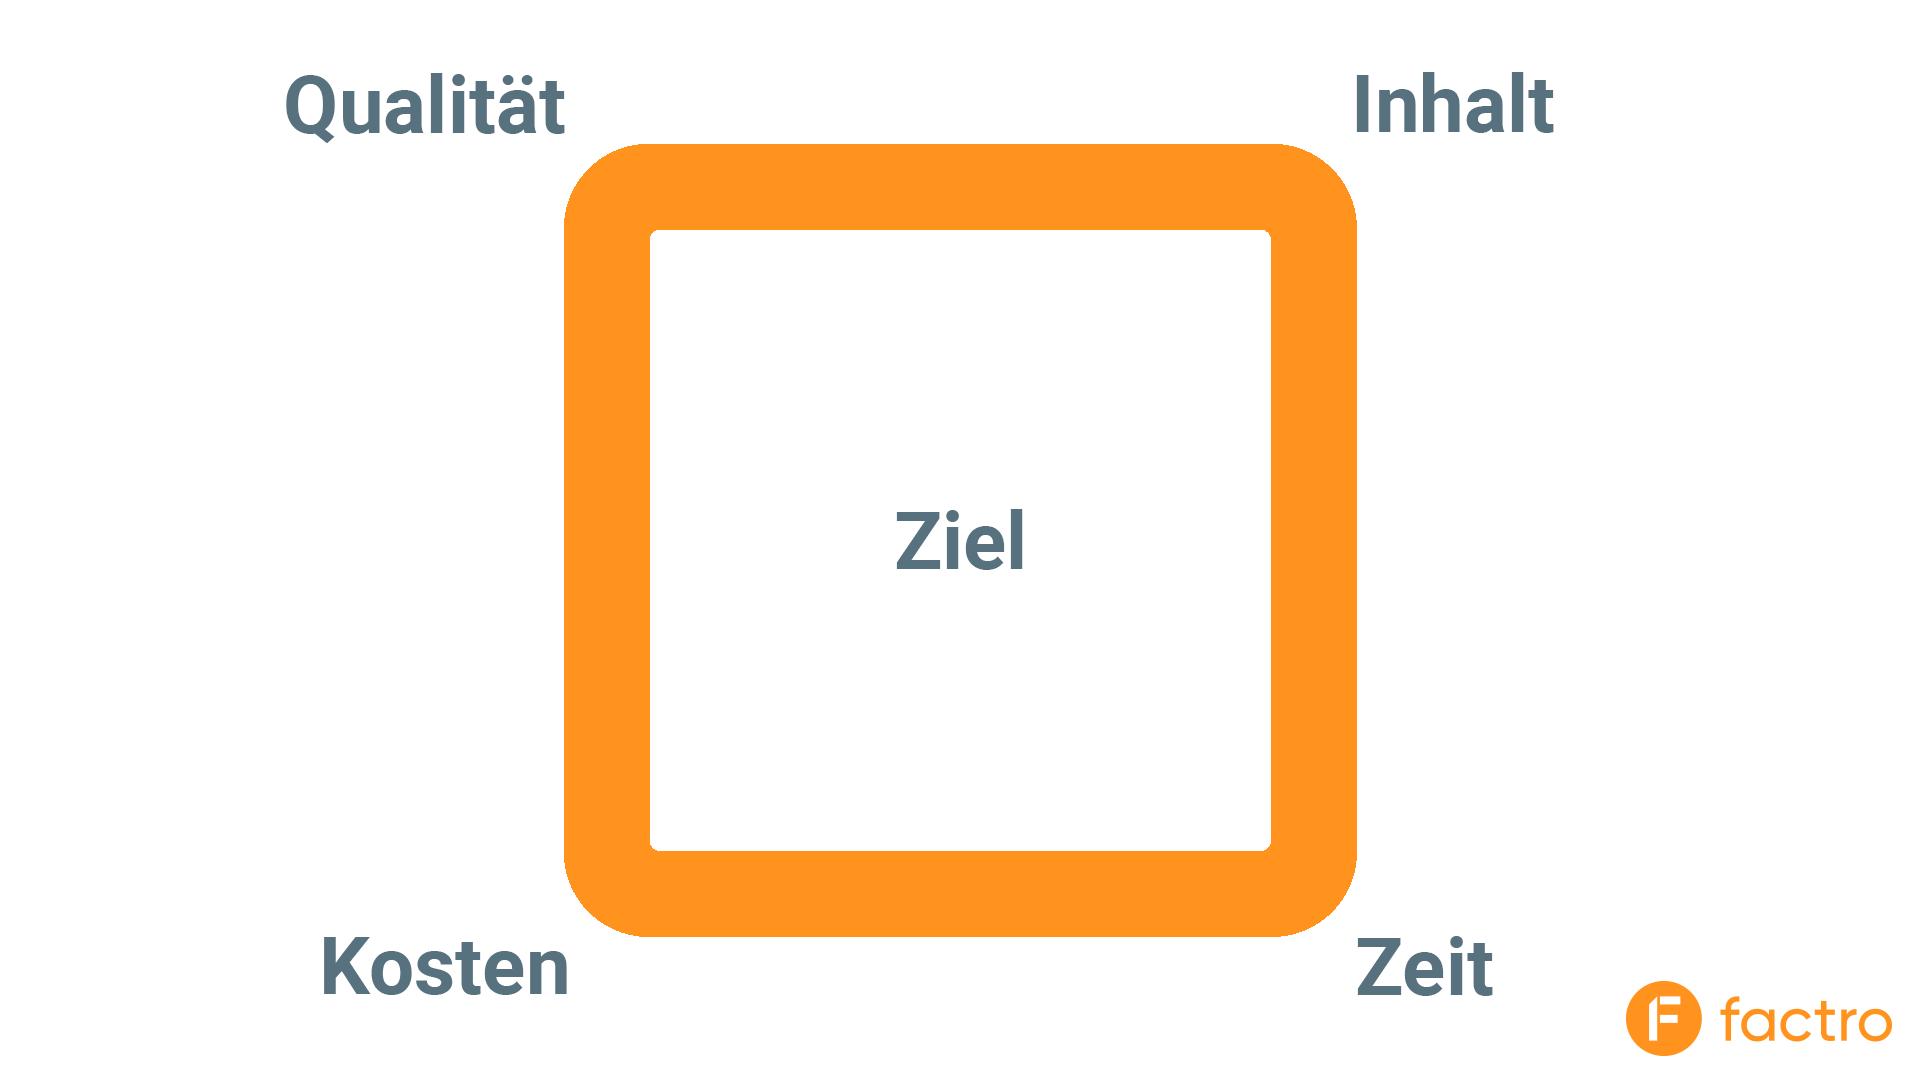 Eine Illustration des Teufelsquadrats